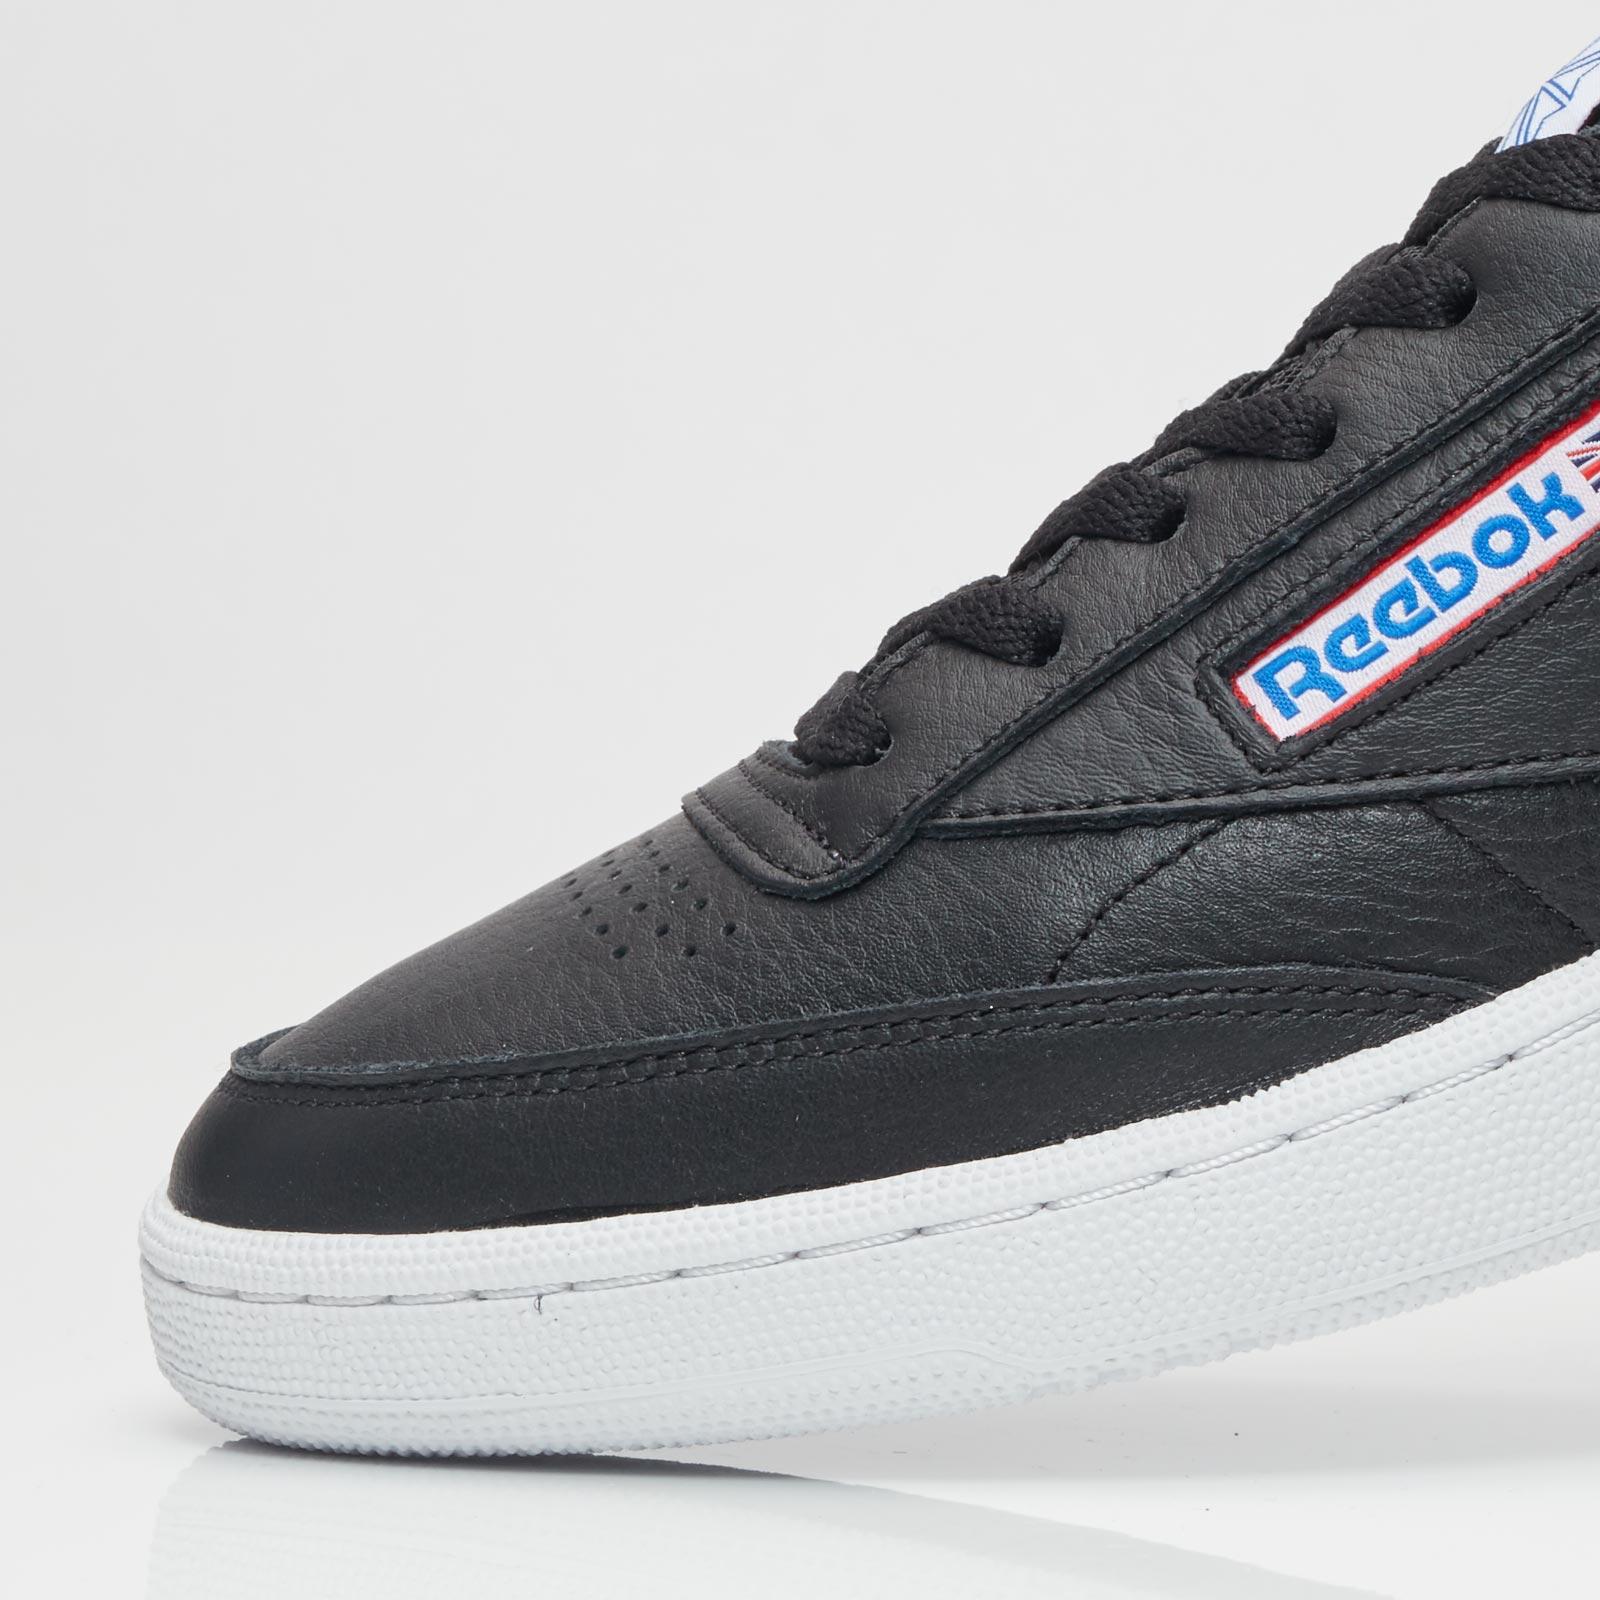 53f558d8ff1c1 Reebok Reebok Club C 85 SO - Bs5213 - Sneakersnstuff